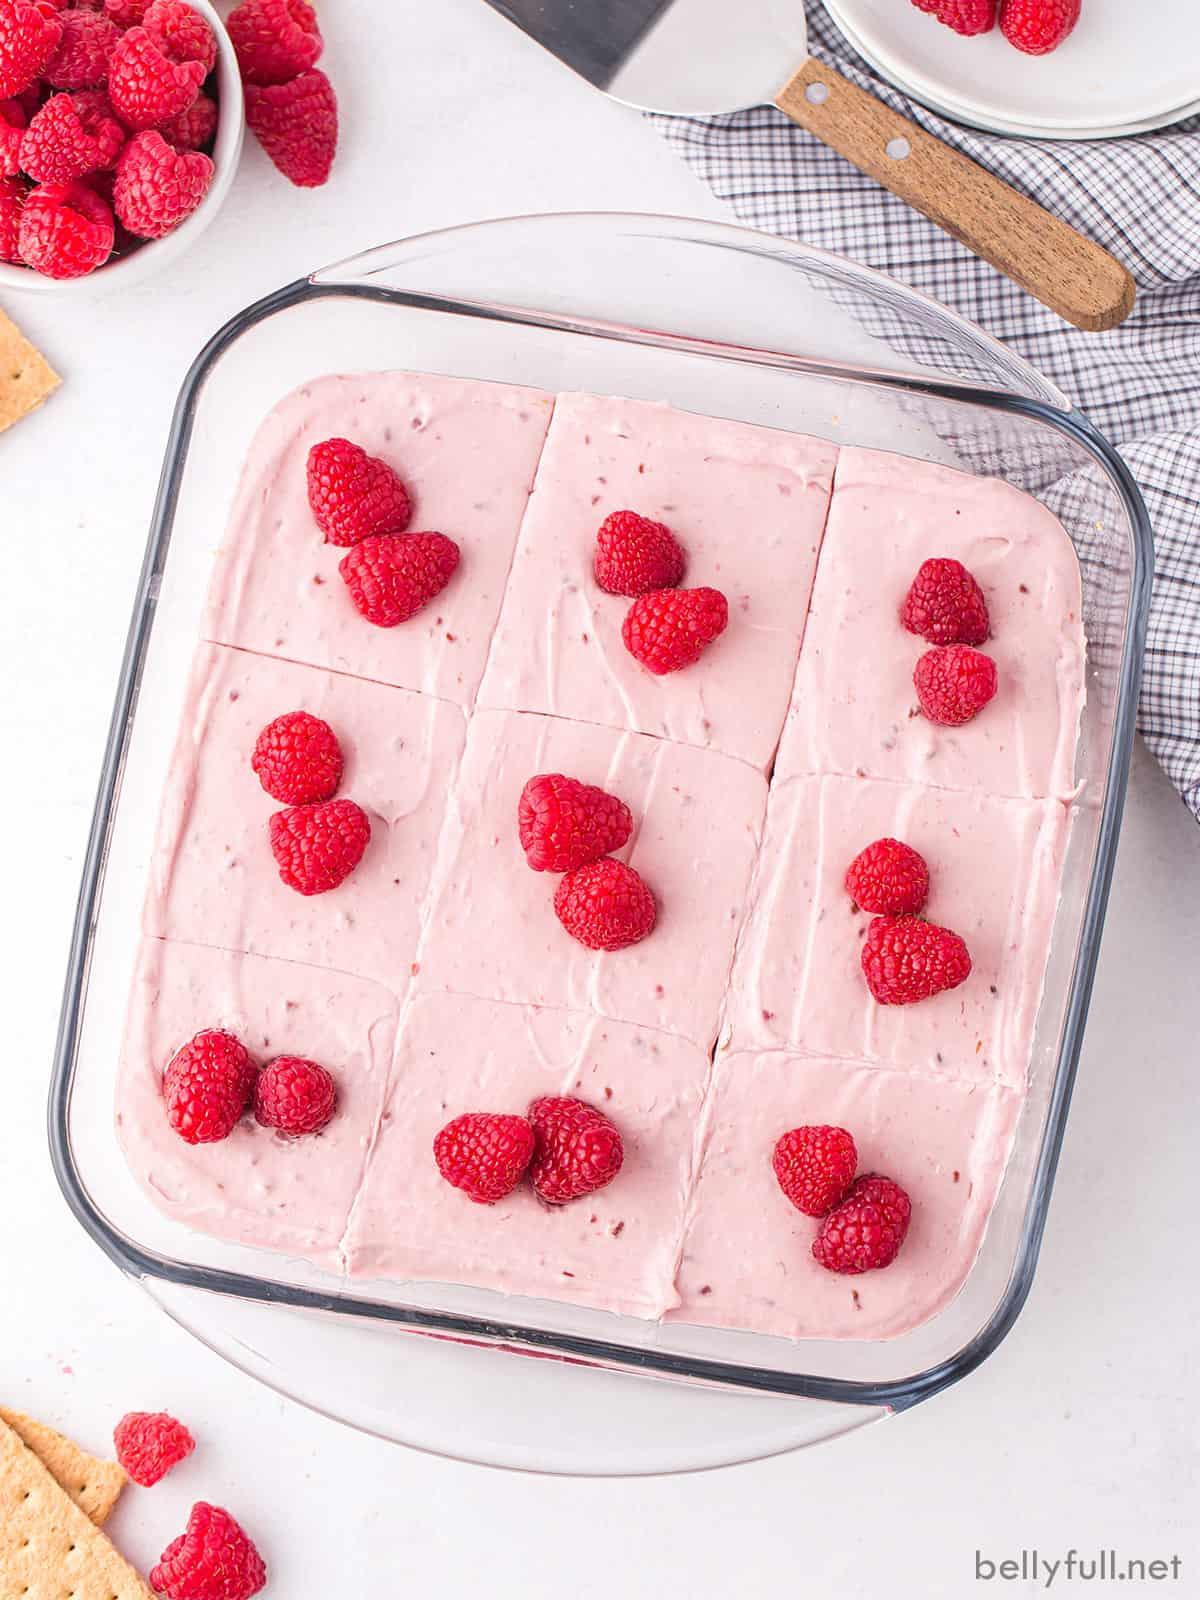 No-bake raspberry cheesecake bars topped with fresh raspberries in a baking dish